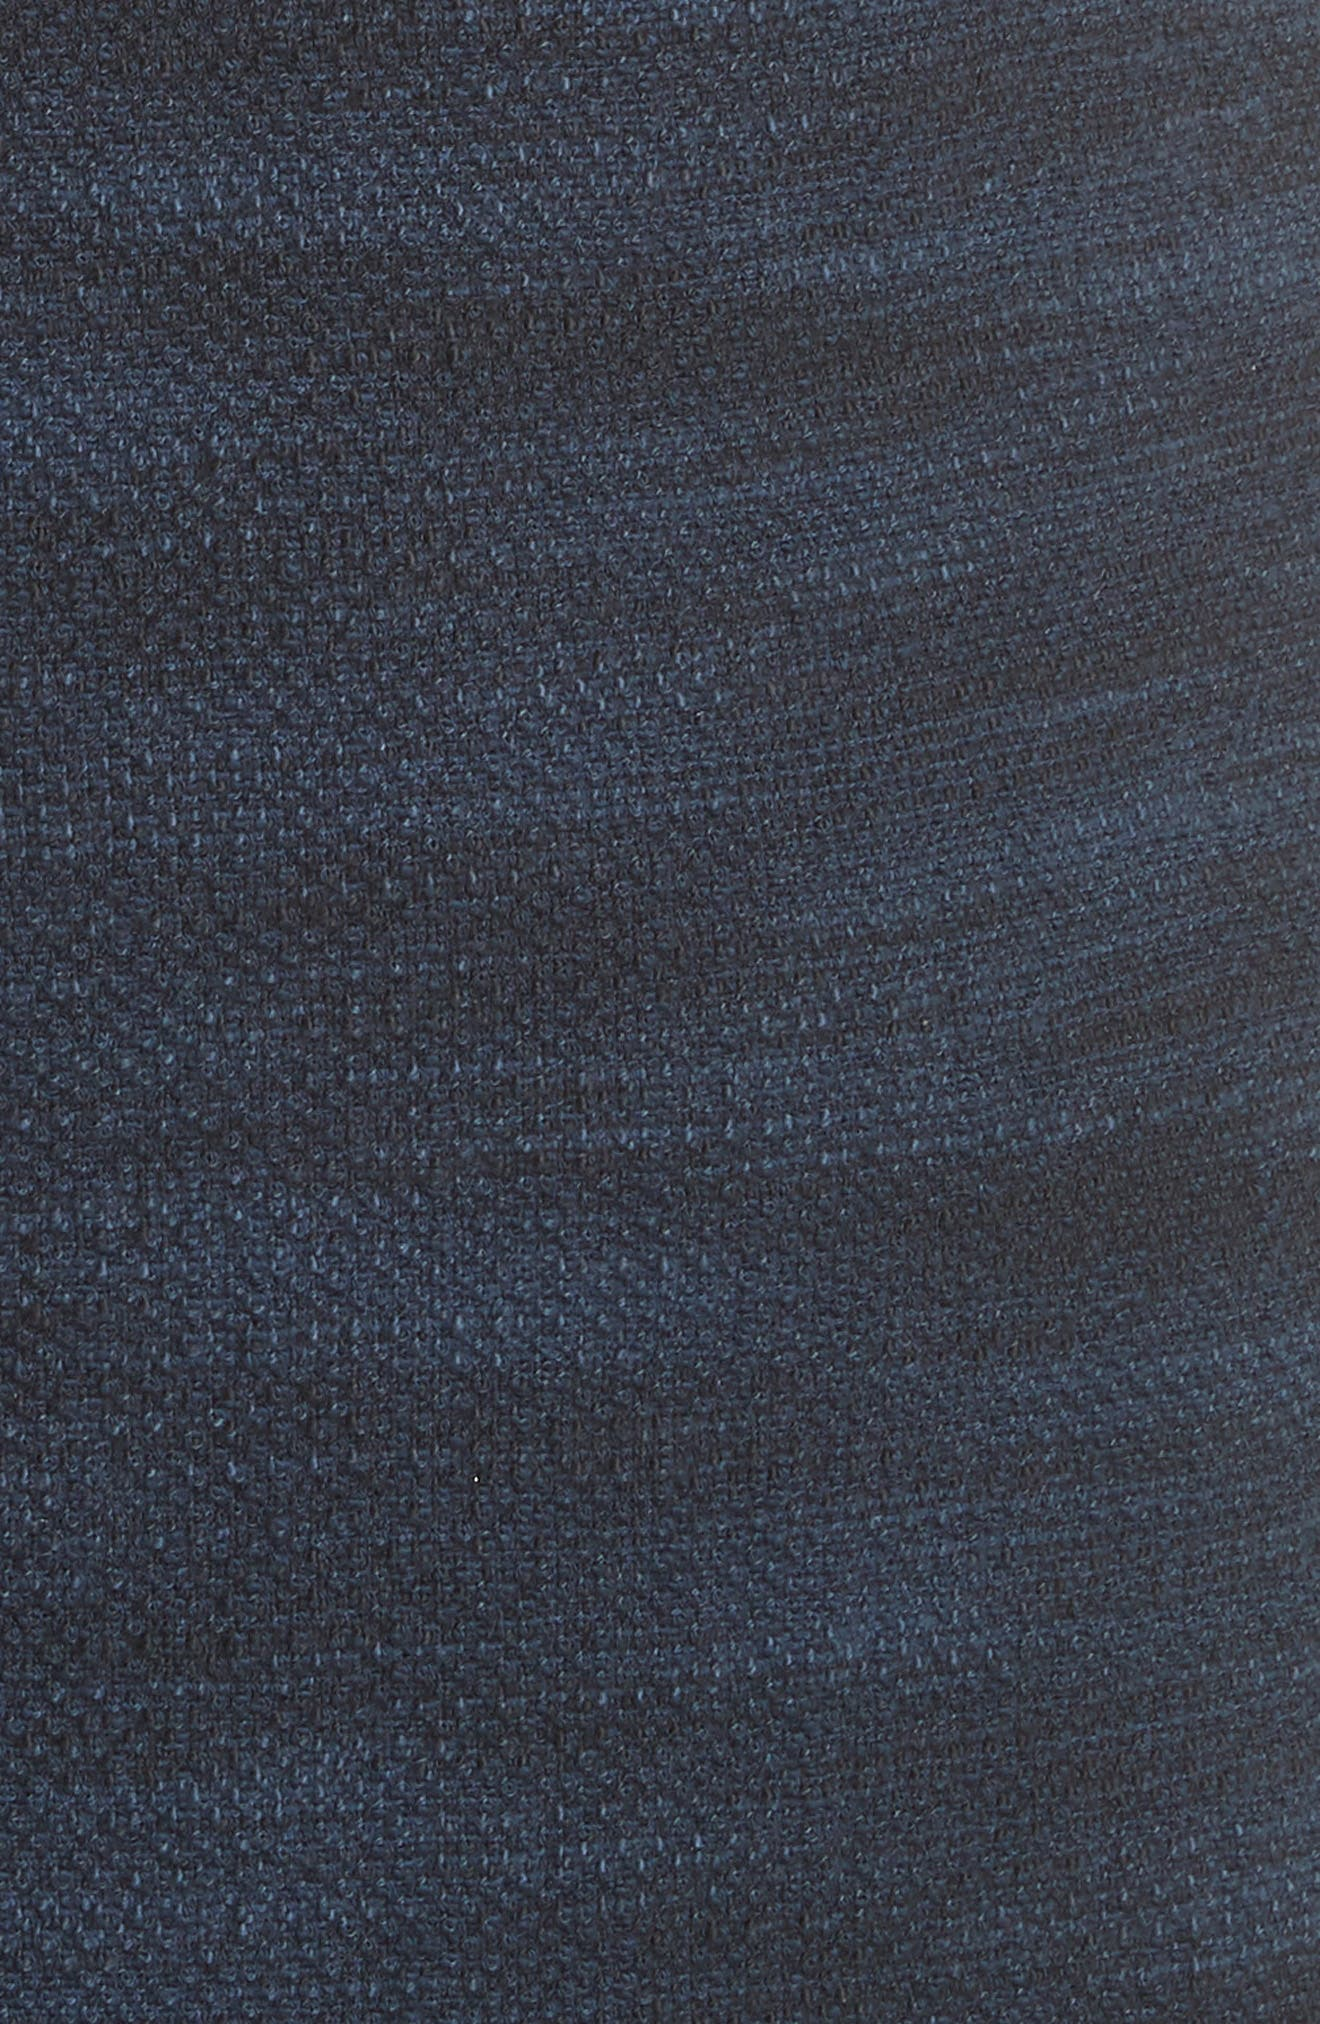 Ruffle Tweed Dress,                             Alternate thumbnail 5, color,                             Navy Combo